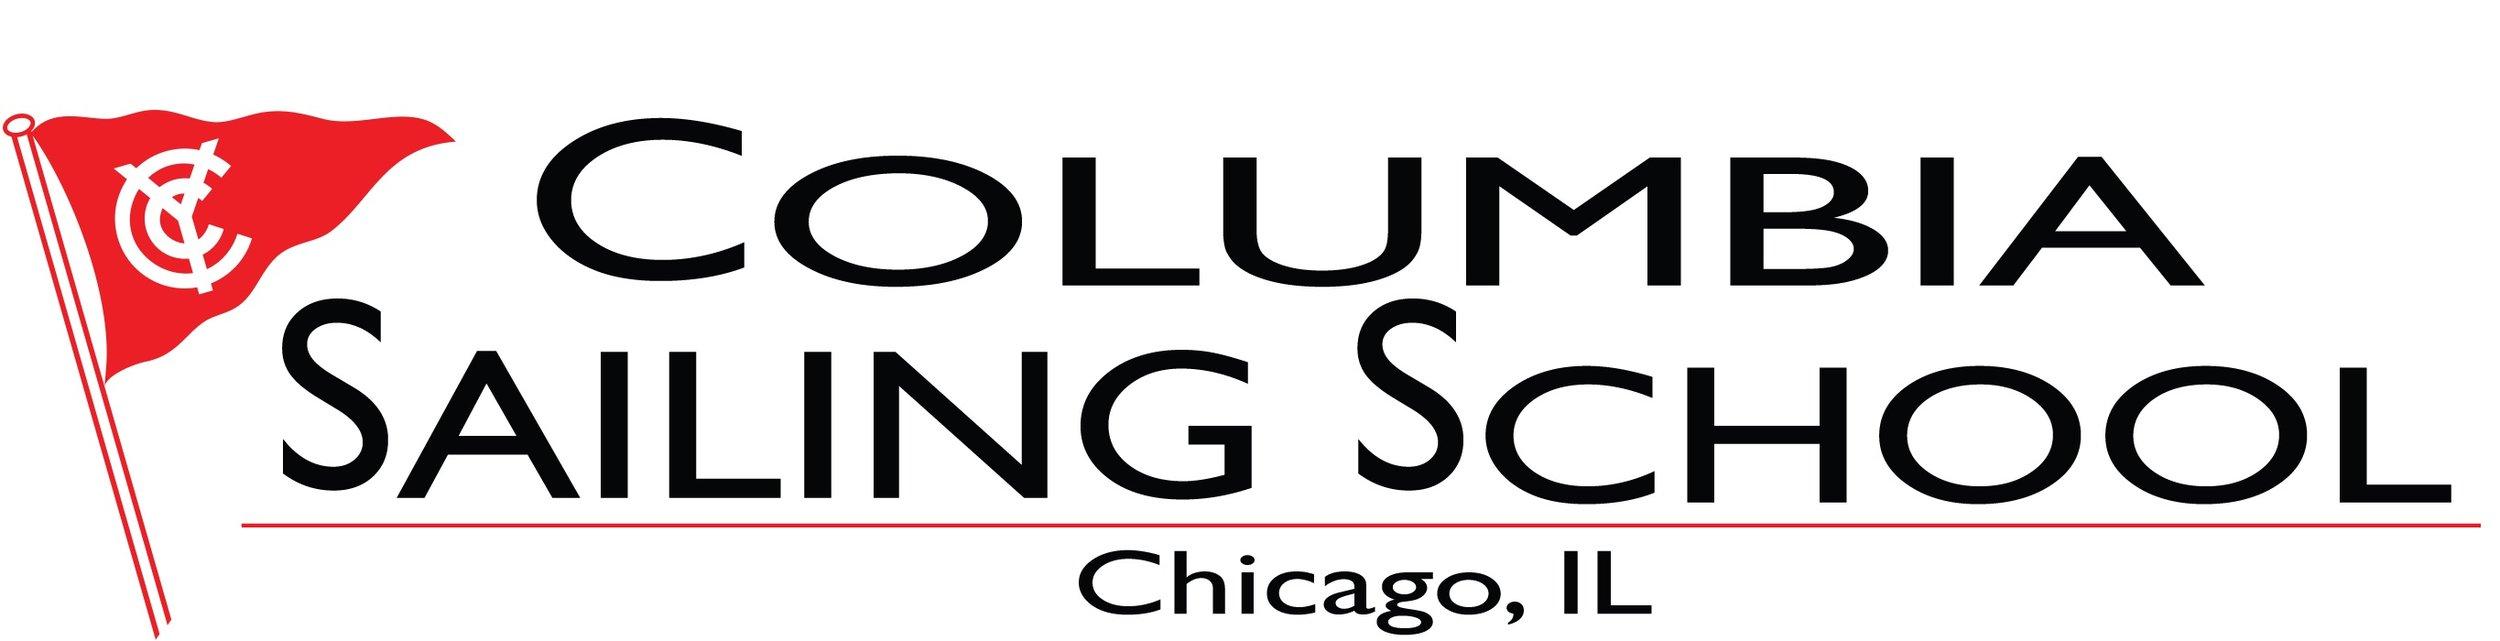 Columbia Sailing School.jpg